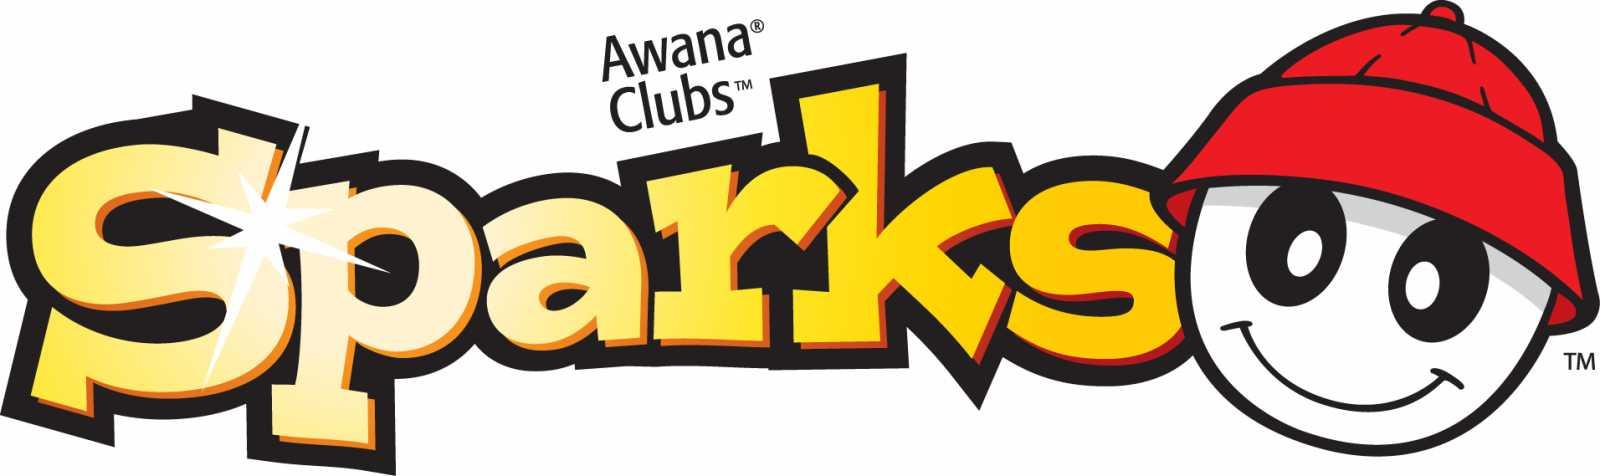 Awana clipart t t clip art download Awana t&t clip art - ClipartFox clip art download